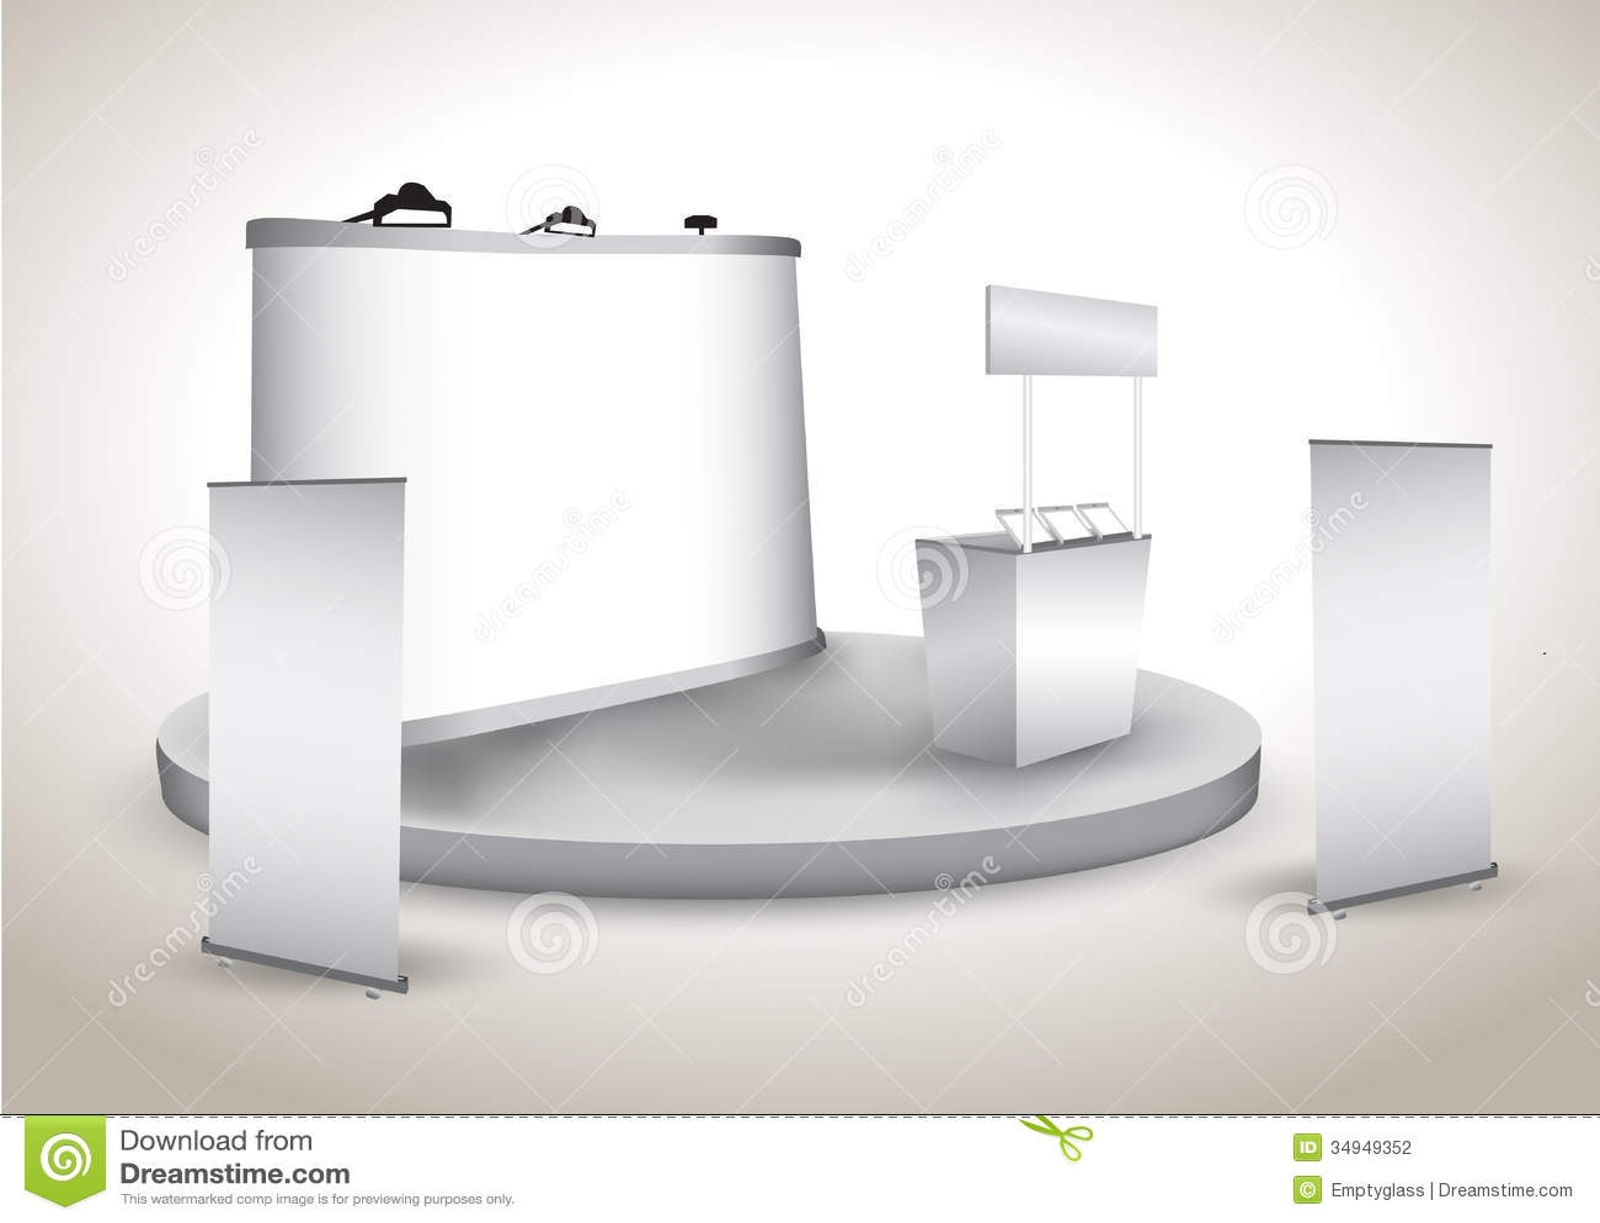 Best 45+ photobooth wallpaper on hipwallpaper | photobooth.